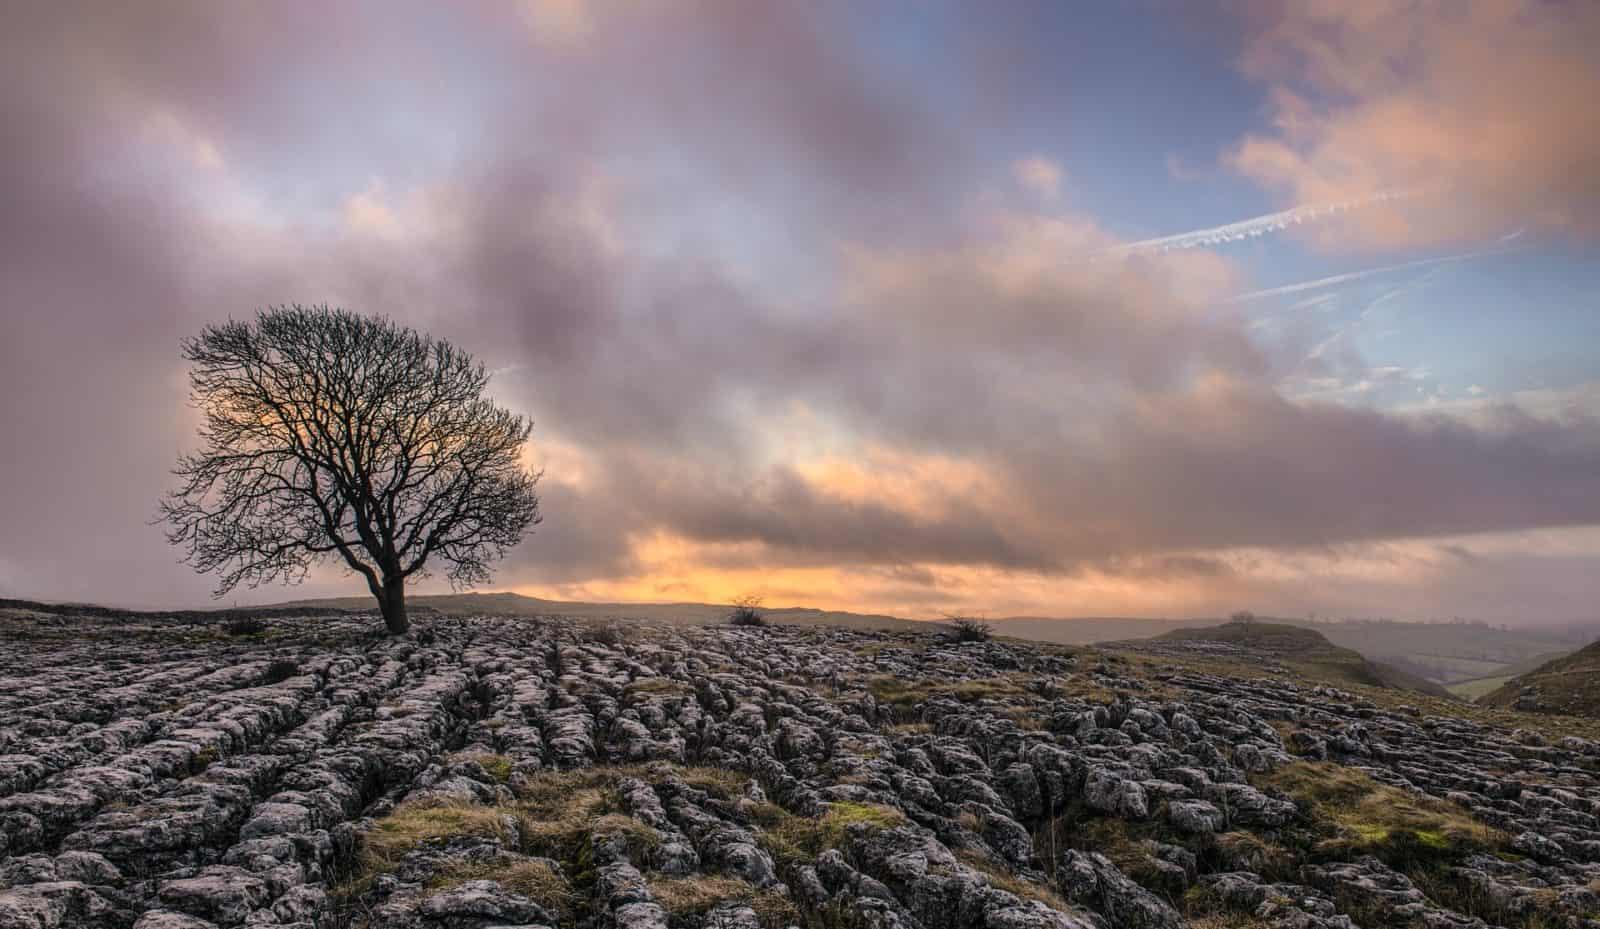 Lone tree in Malham, UK